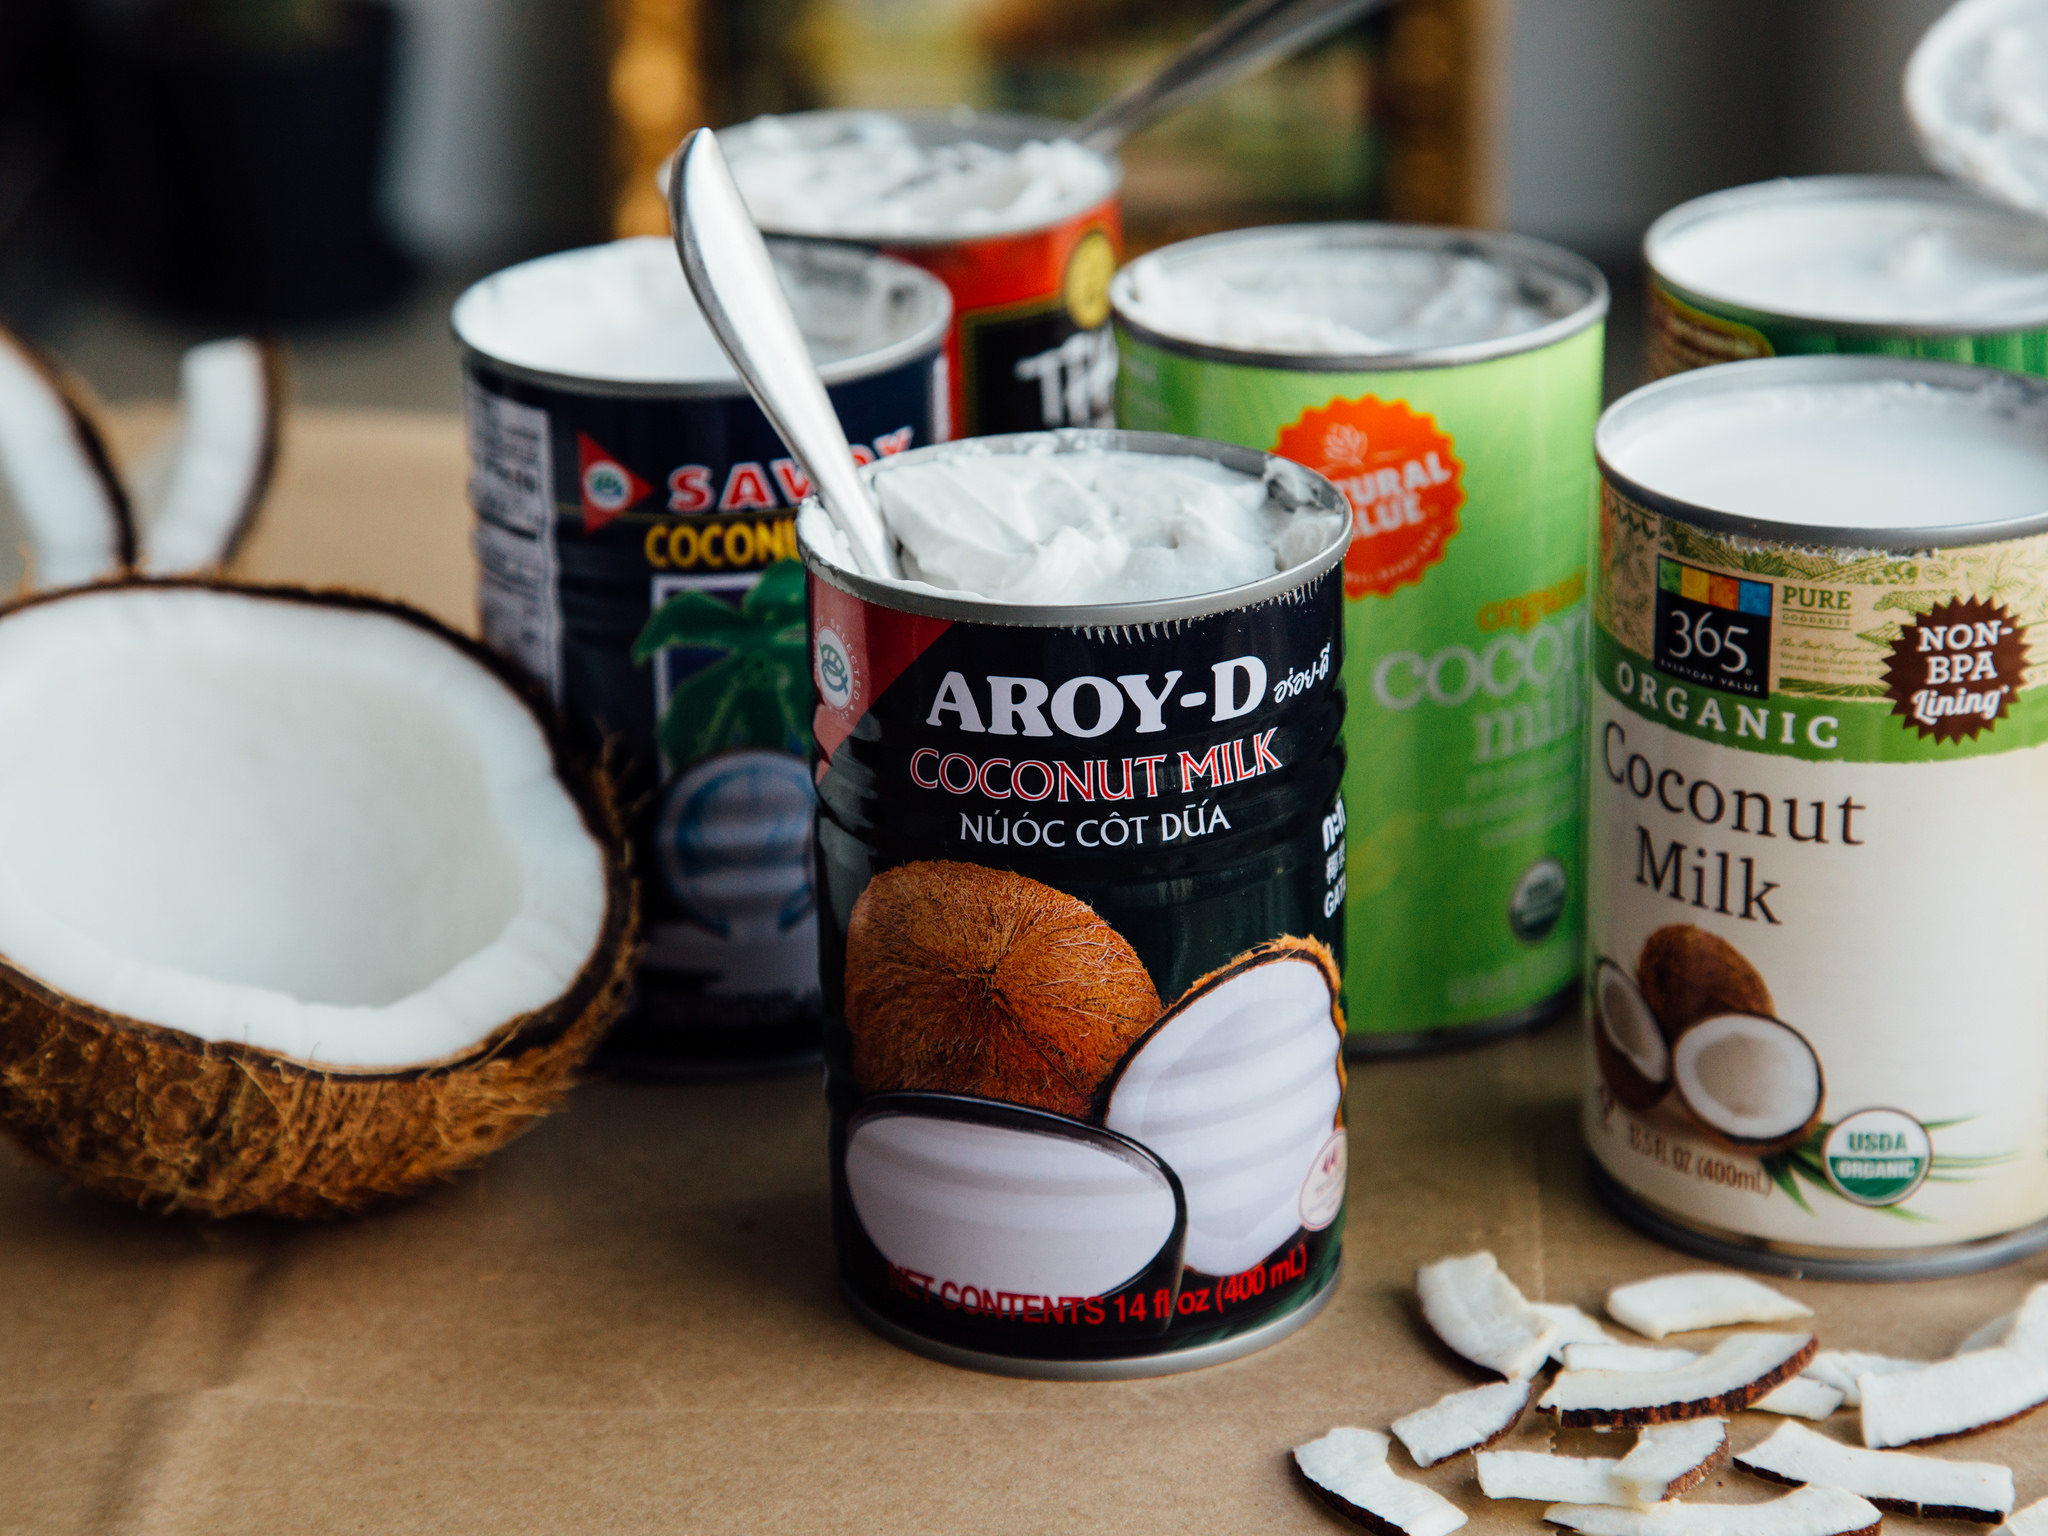 canned-coconut-milk-coconut-cream-101